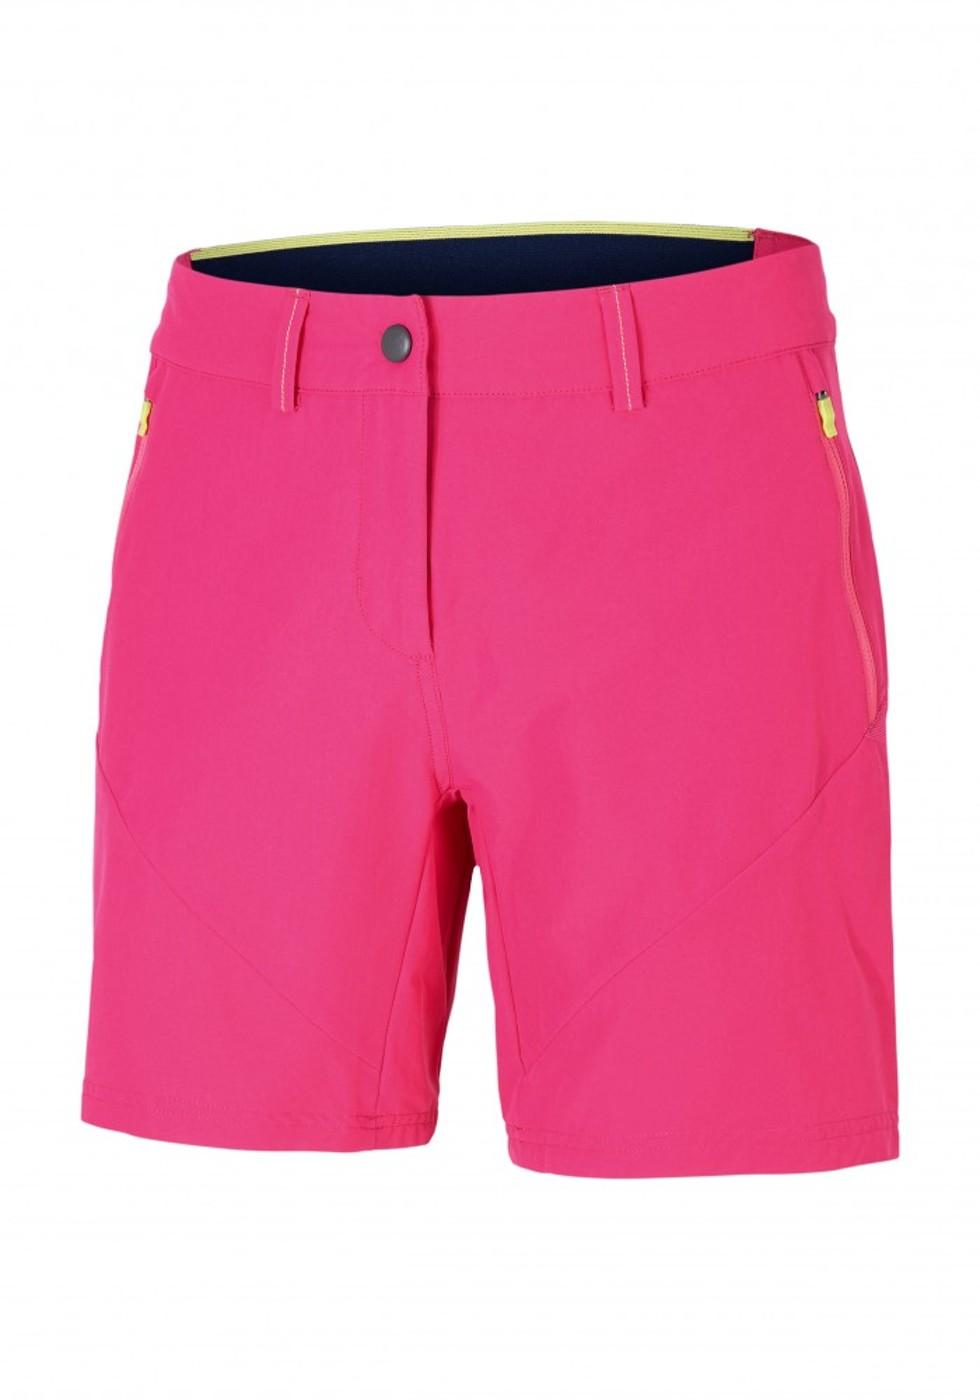 ZIENER EIB X-FUNCTION lady (shorts) - Damen